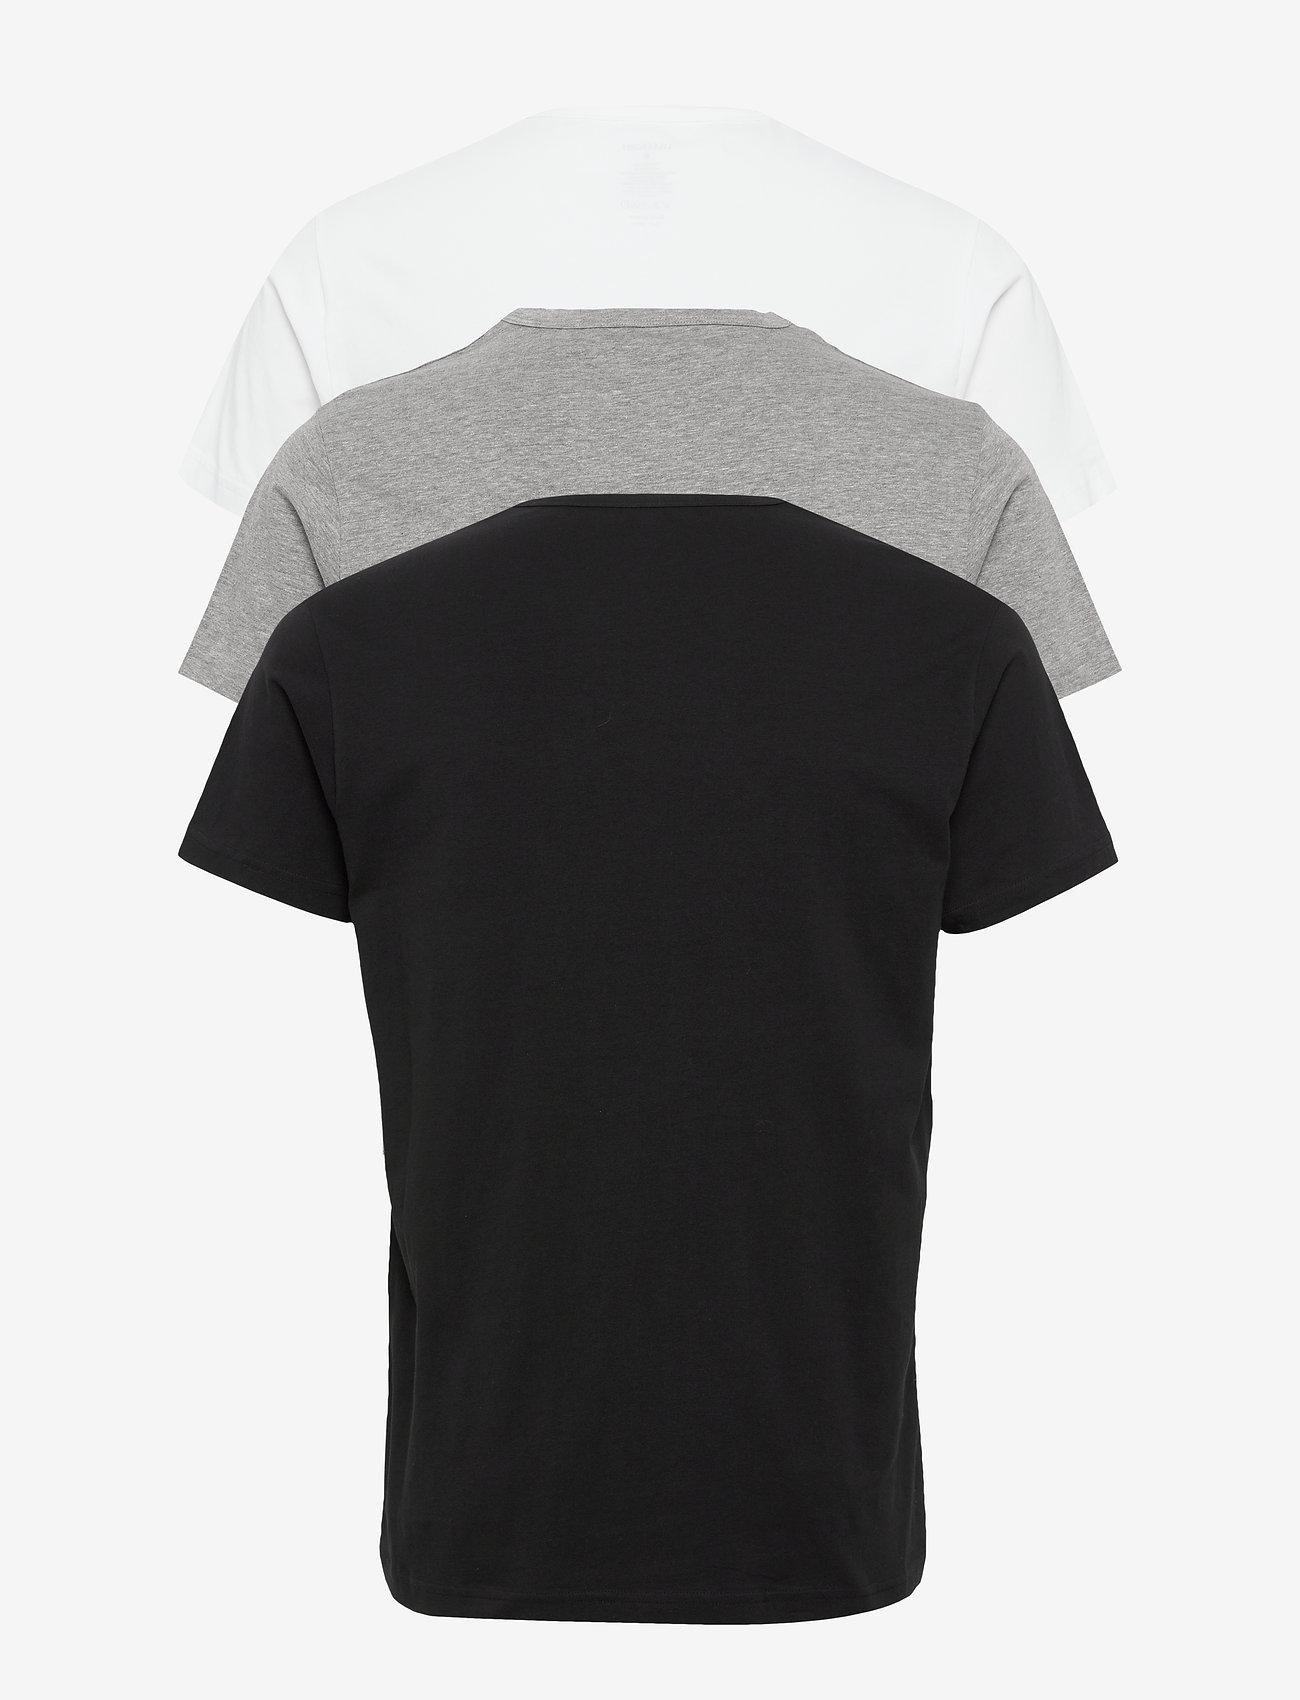 Lyle & Scott - MAXWELL - t-shirts basiques - bright white/grey marl/black - 1